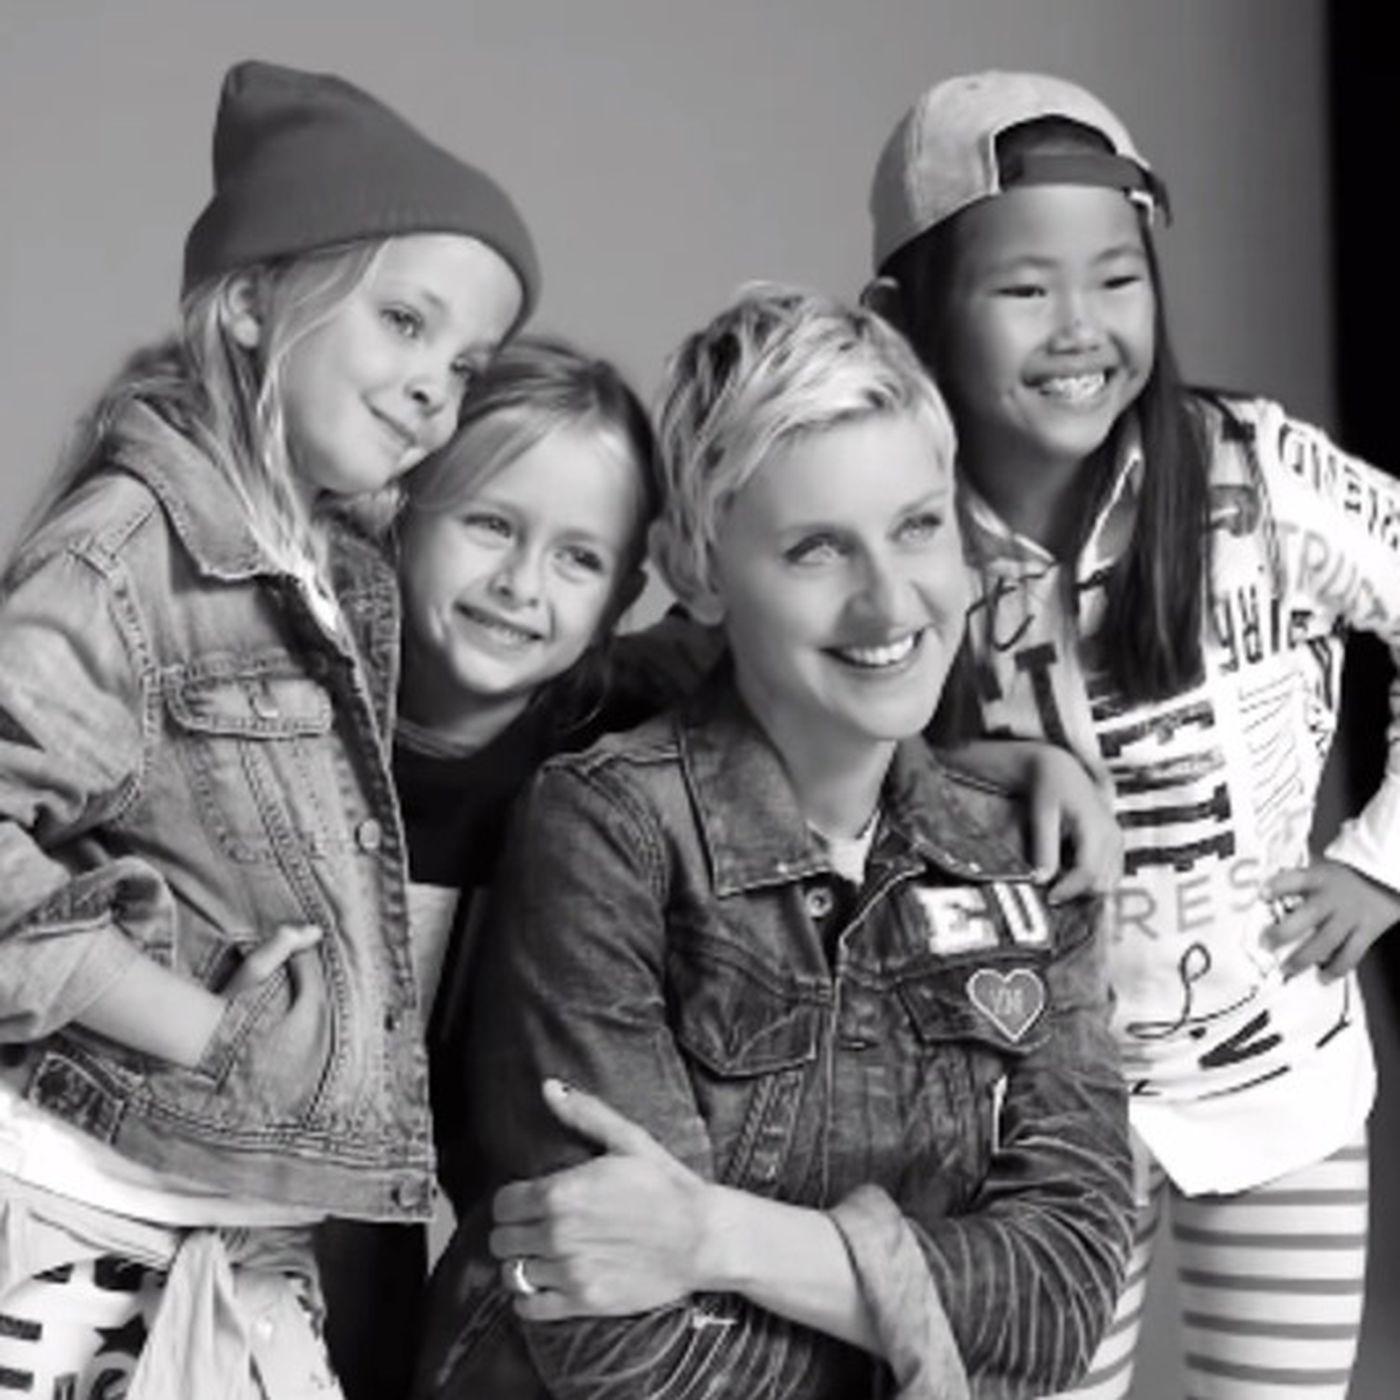 Ellen Degeneres Partnered With Gap Kids For A Clothing Line Racked